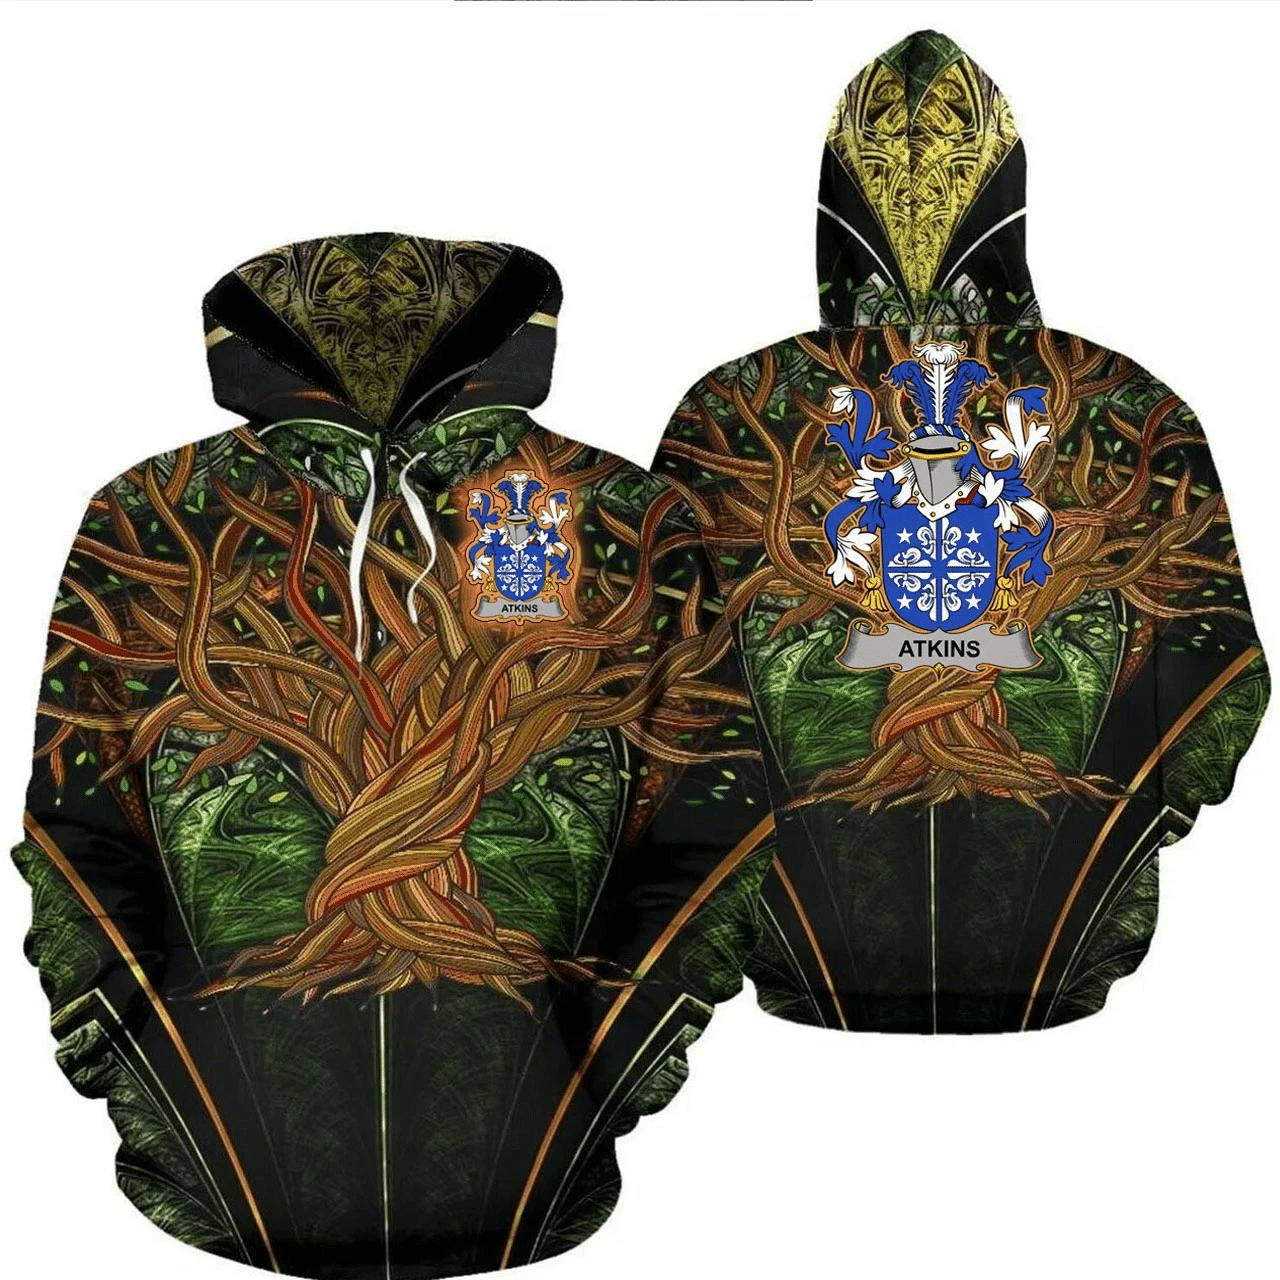 1stIreland Ireland Hoodie - Atkins Irish Family Crest Hoodie - Tree Of Life A7